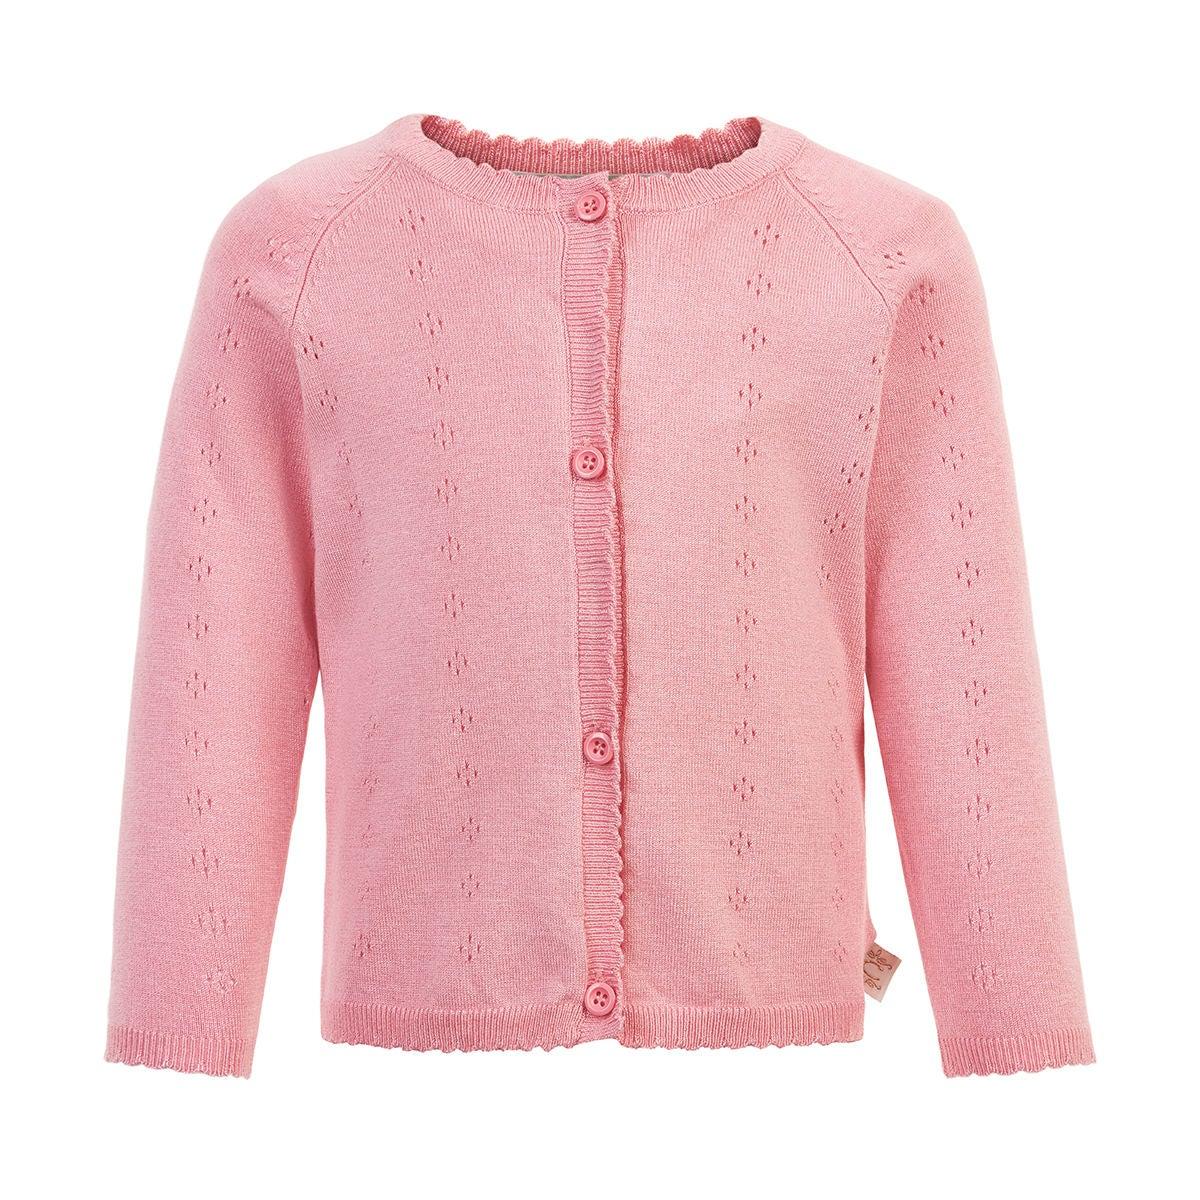 Creamie Pointelle Kofta, Pink Icing, 80